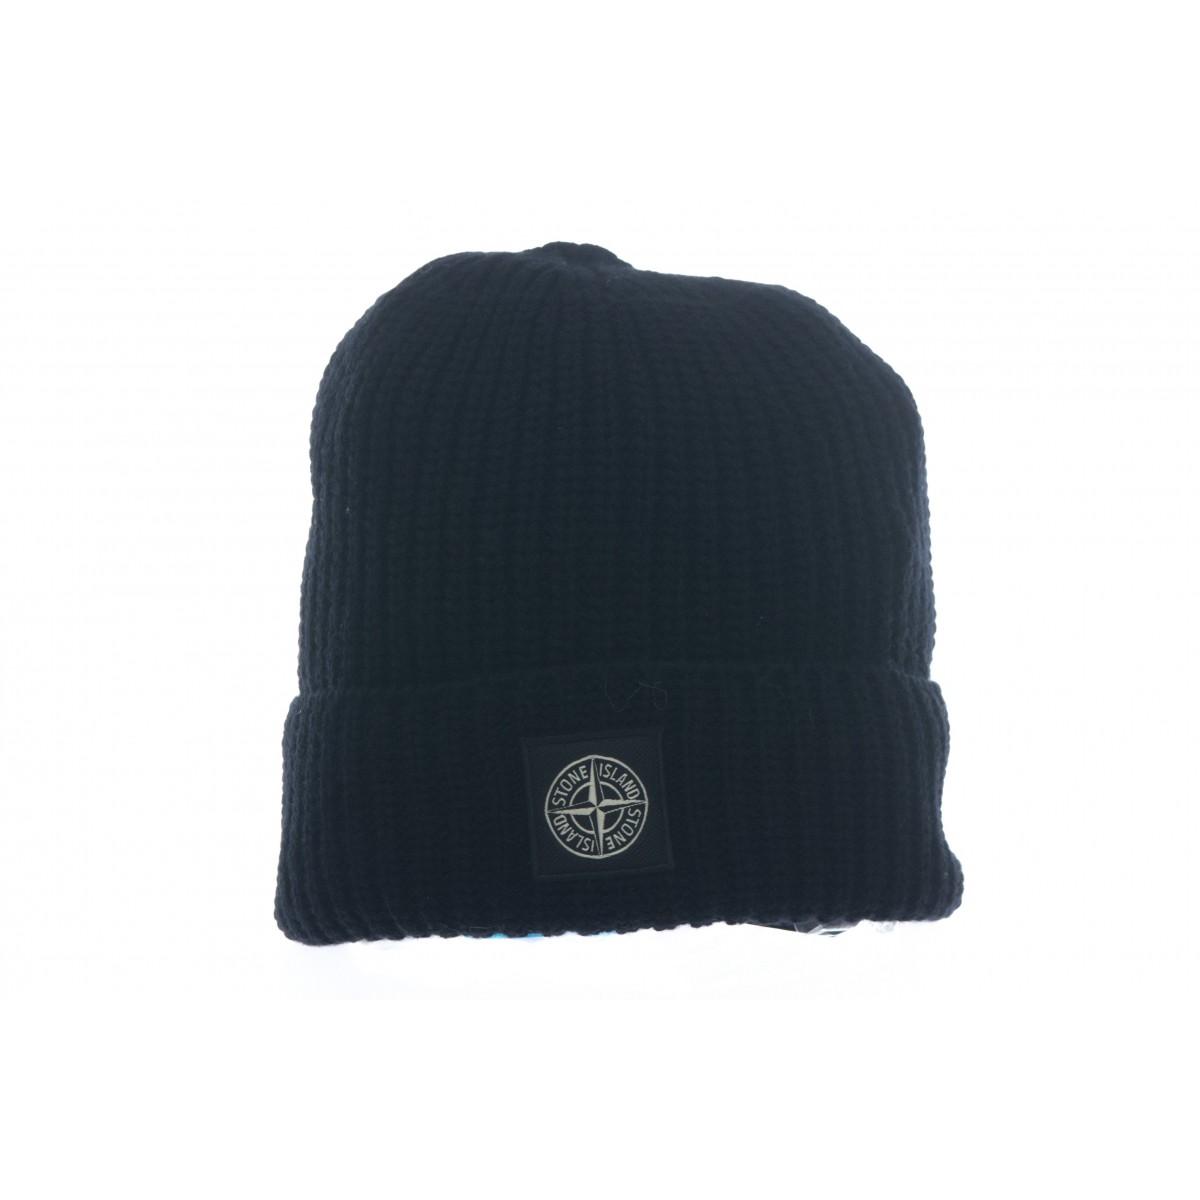 Felpa - N10b5 berretto lana